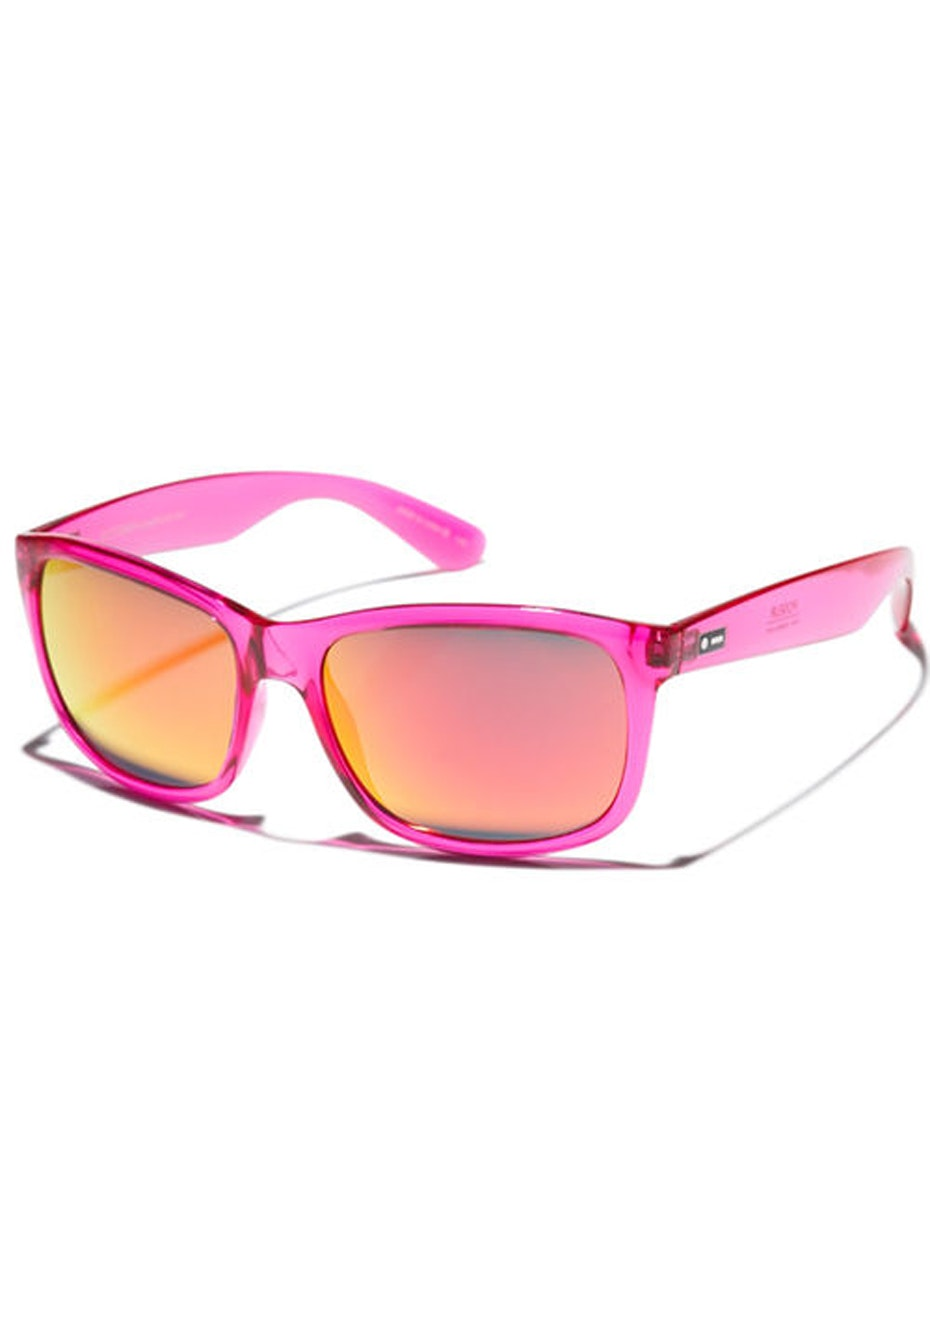 Dot Dash - Poseur - Pink Translucent